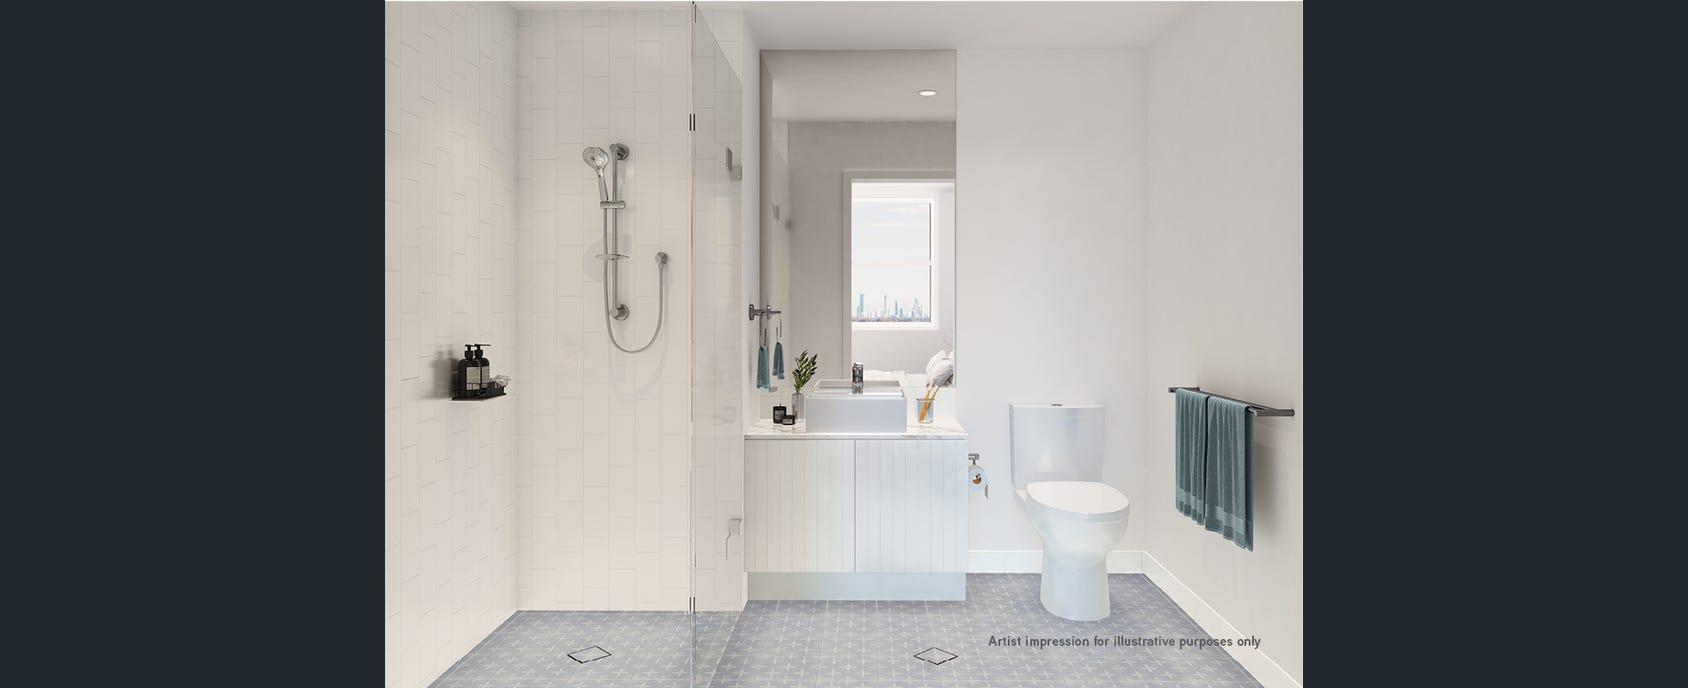 33256513__1624420069-31710-Bathroom.jpg